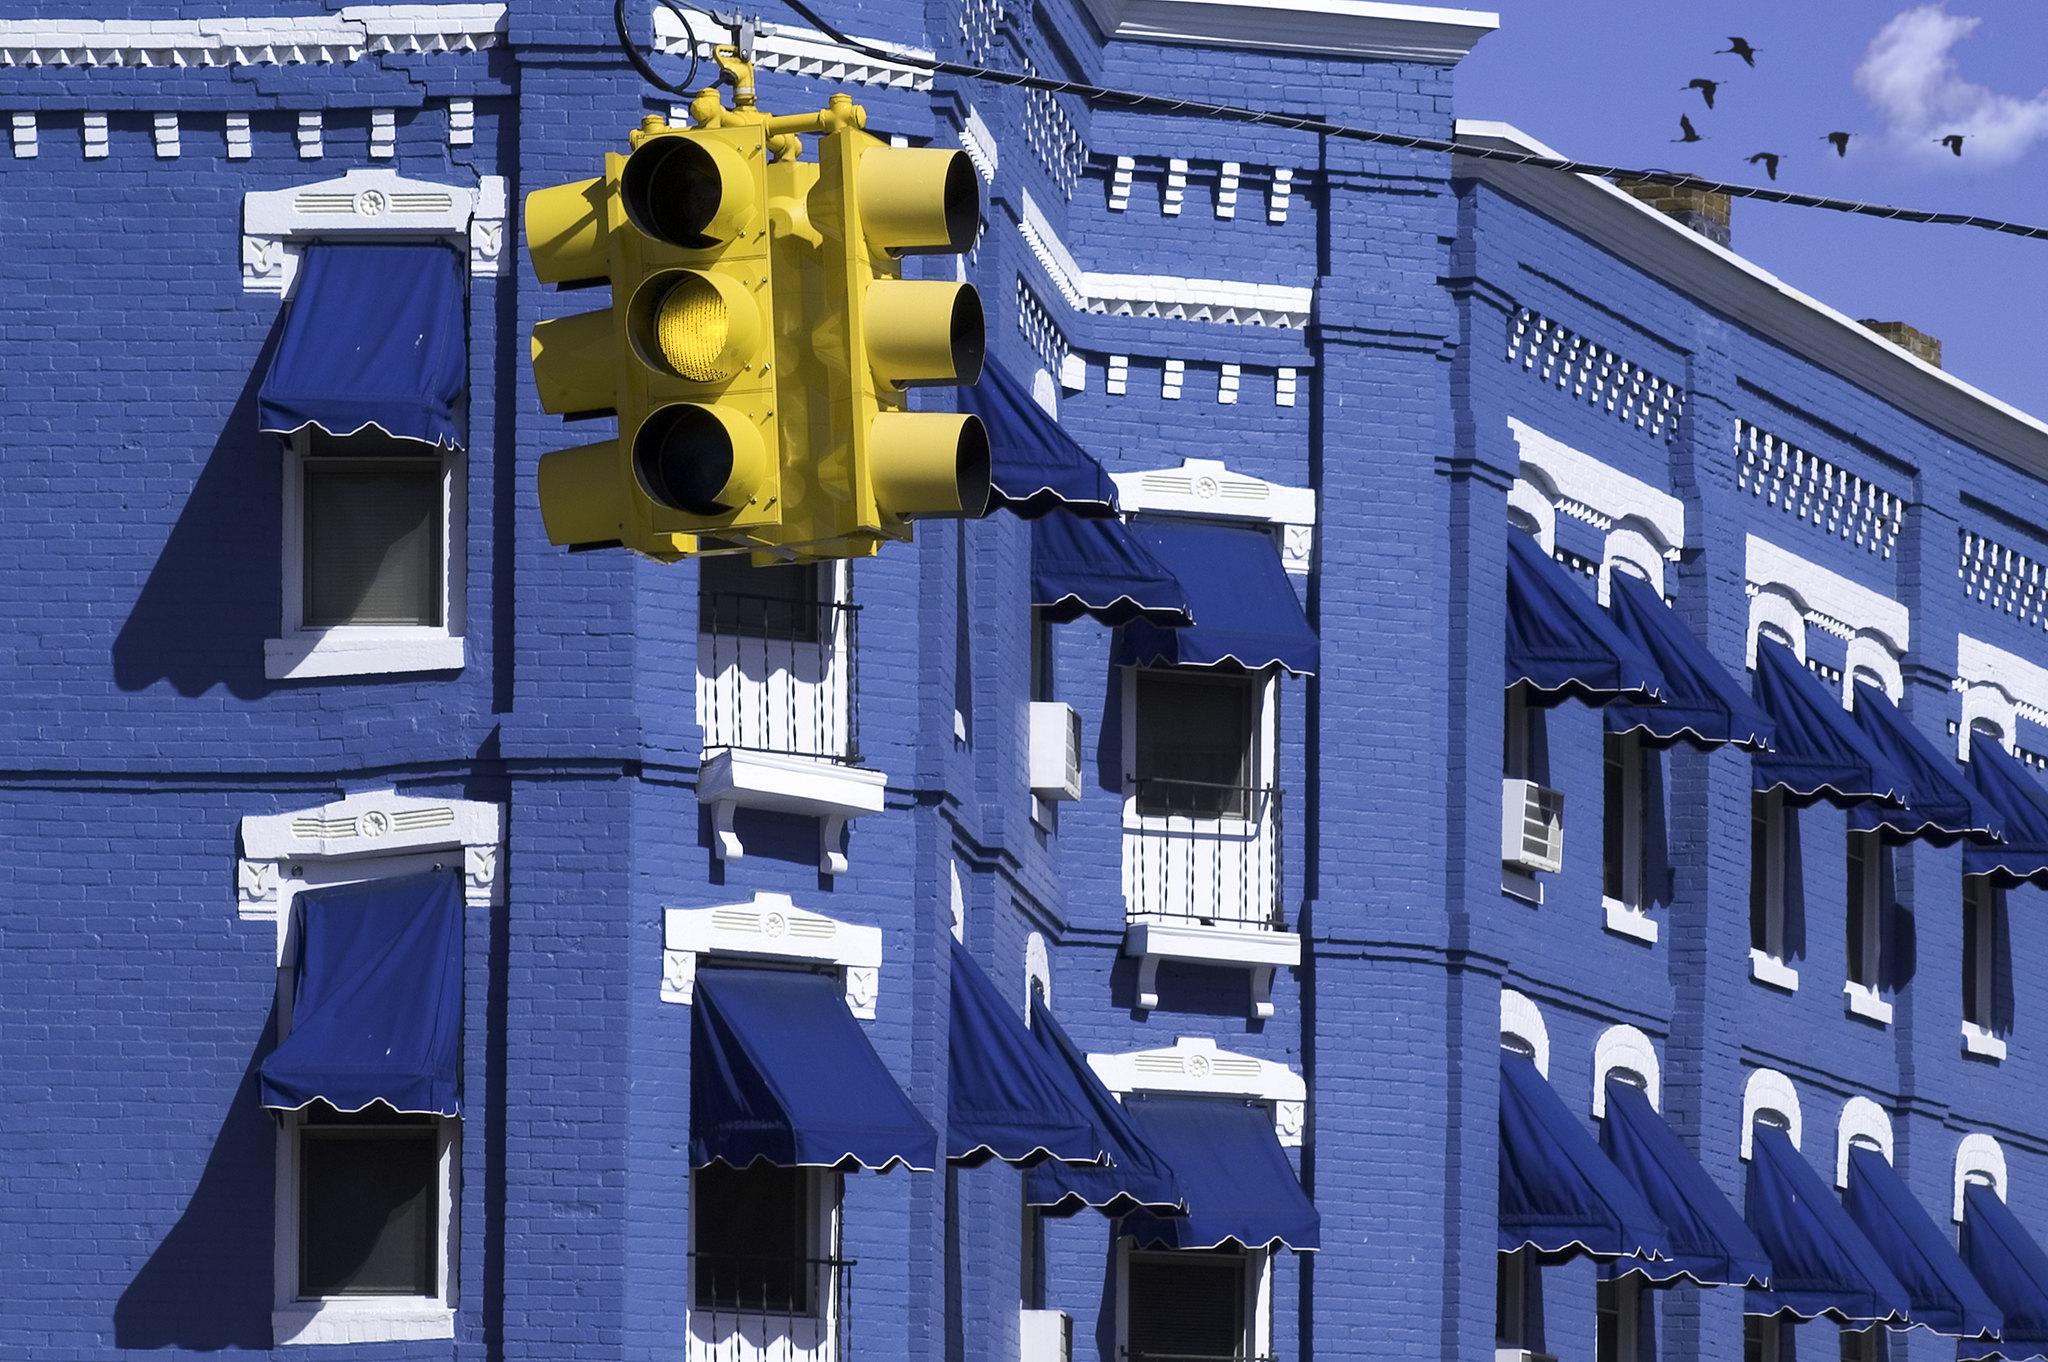 Yellow Light by fotoman91